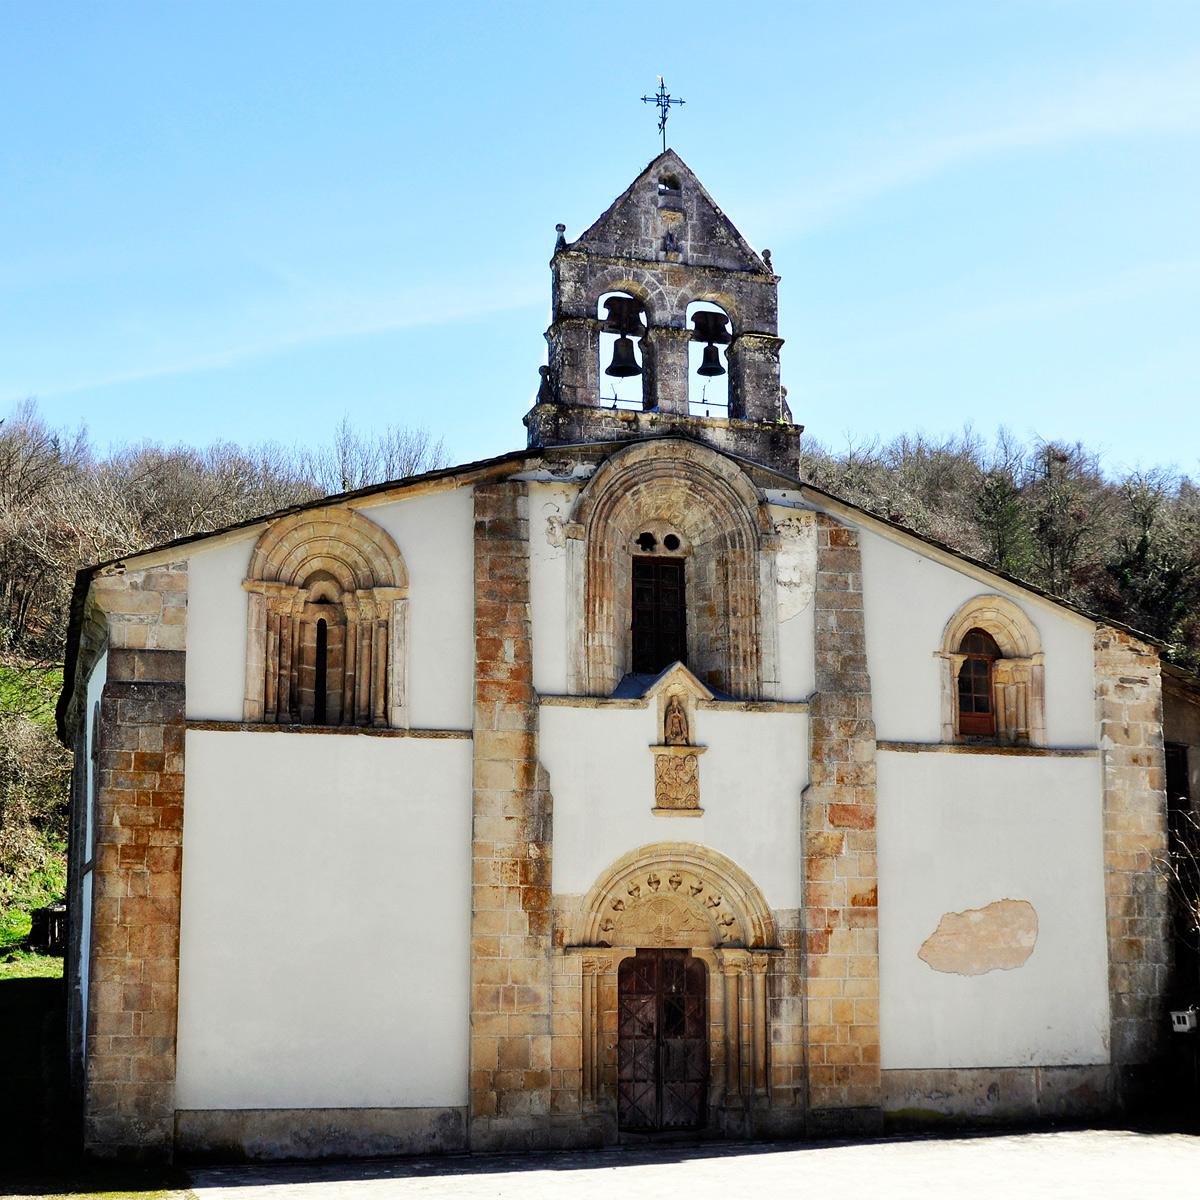 Monaterio de Penamaior fachada del templo